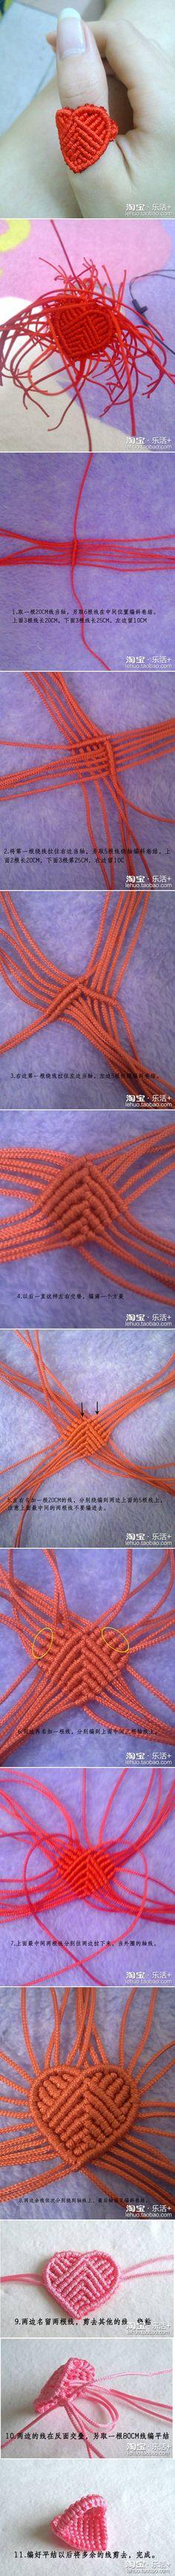 #DIY Hand Knit Heart Ring Anillo Corazon #Tutorial #Macrame